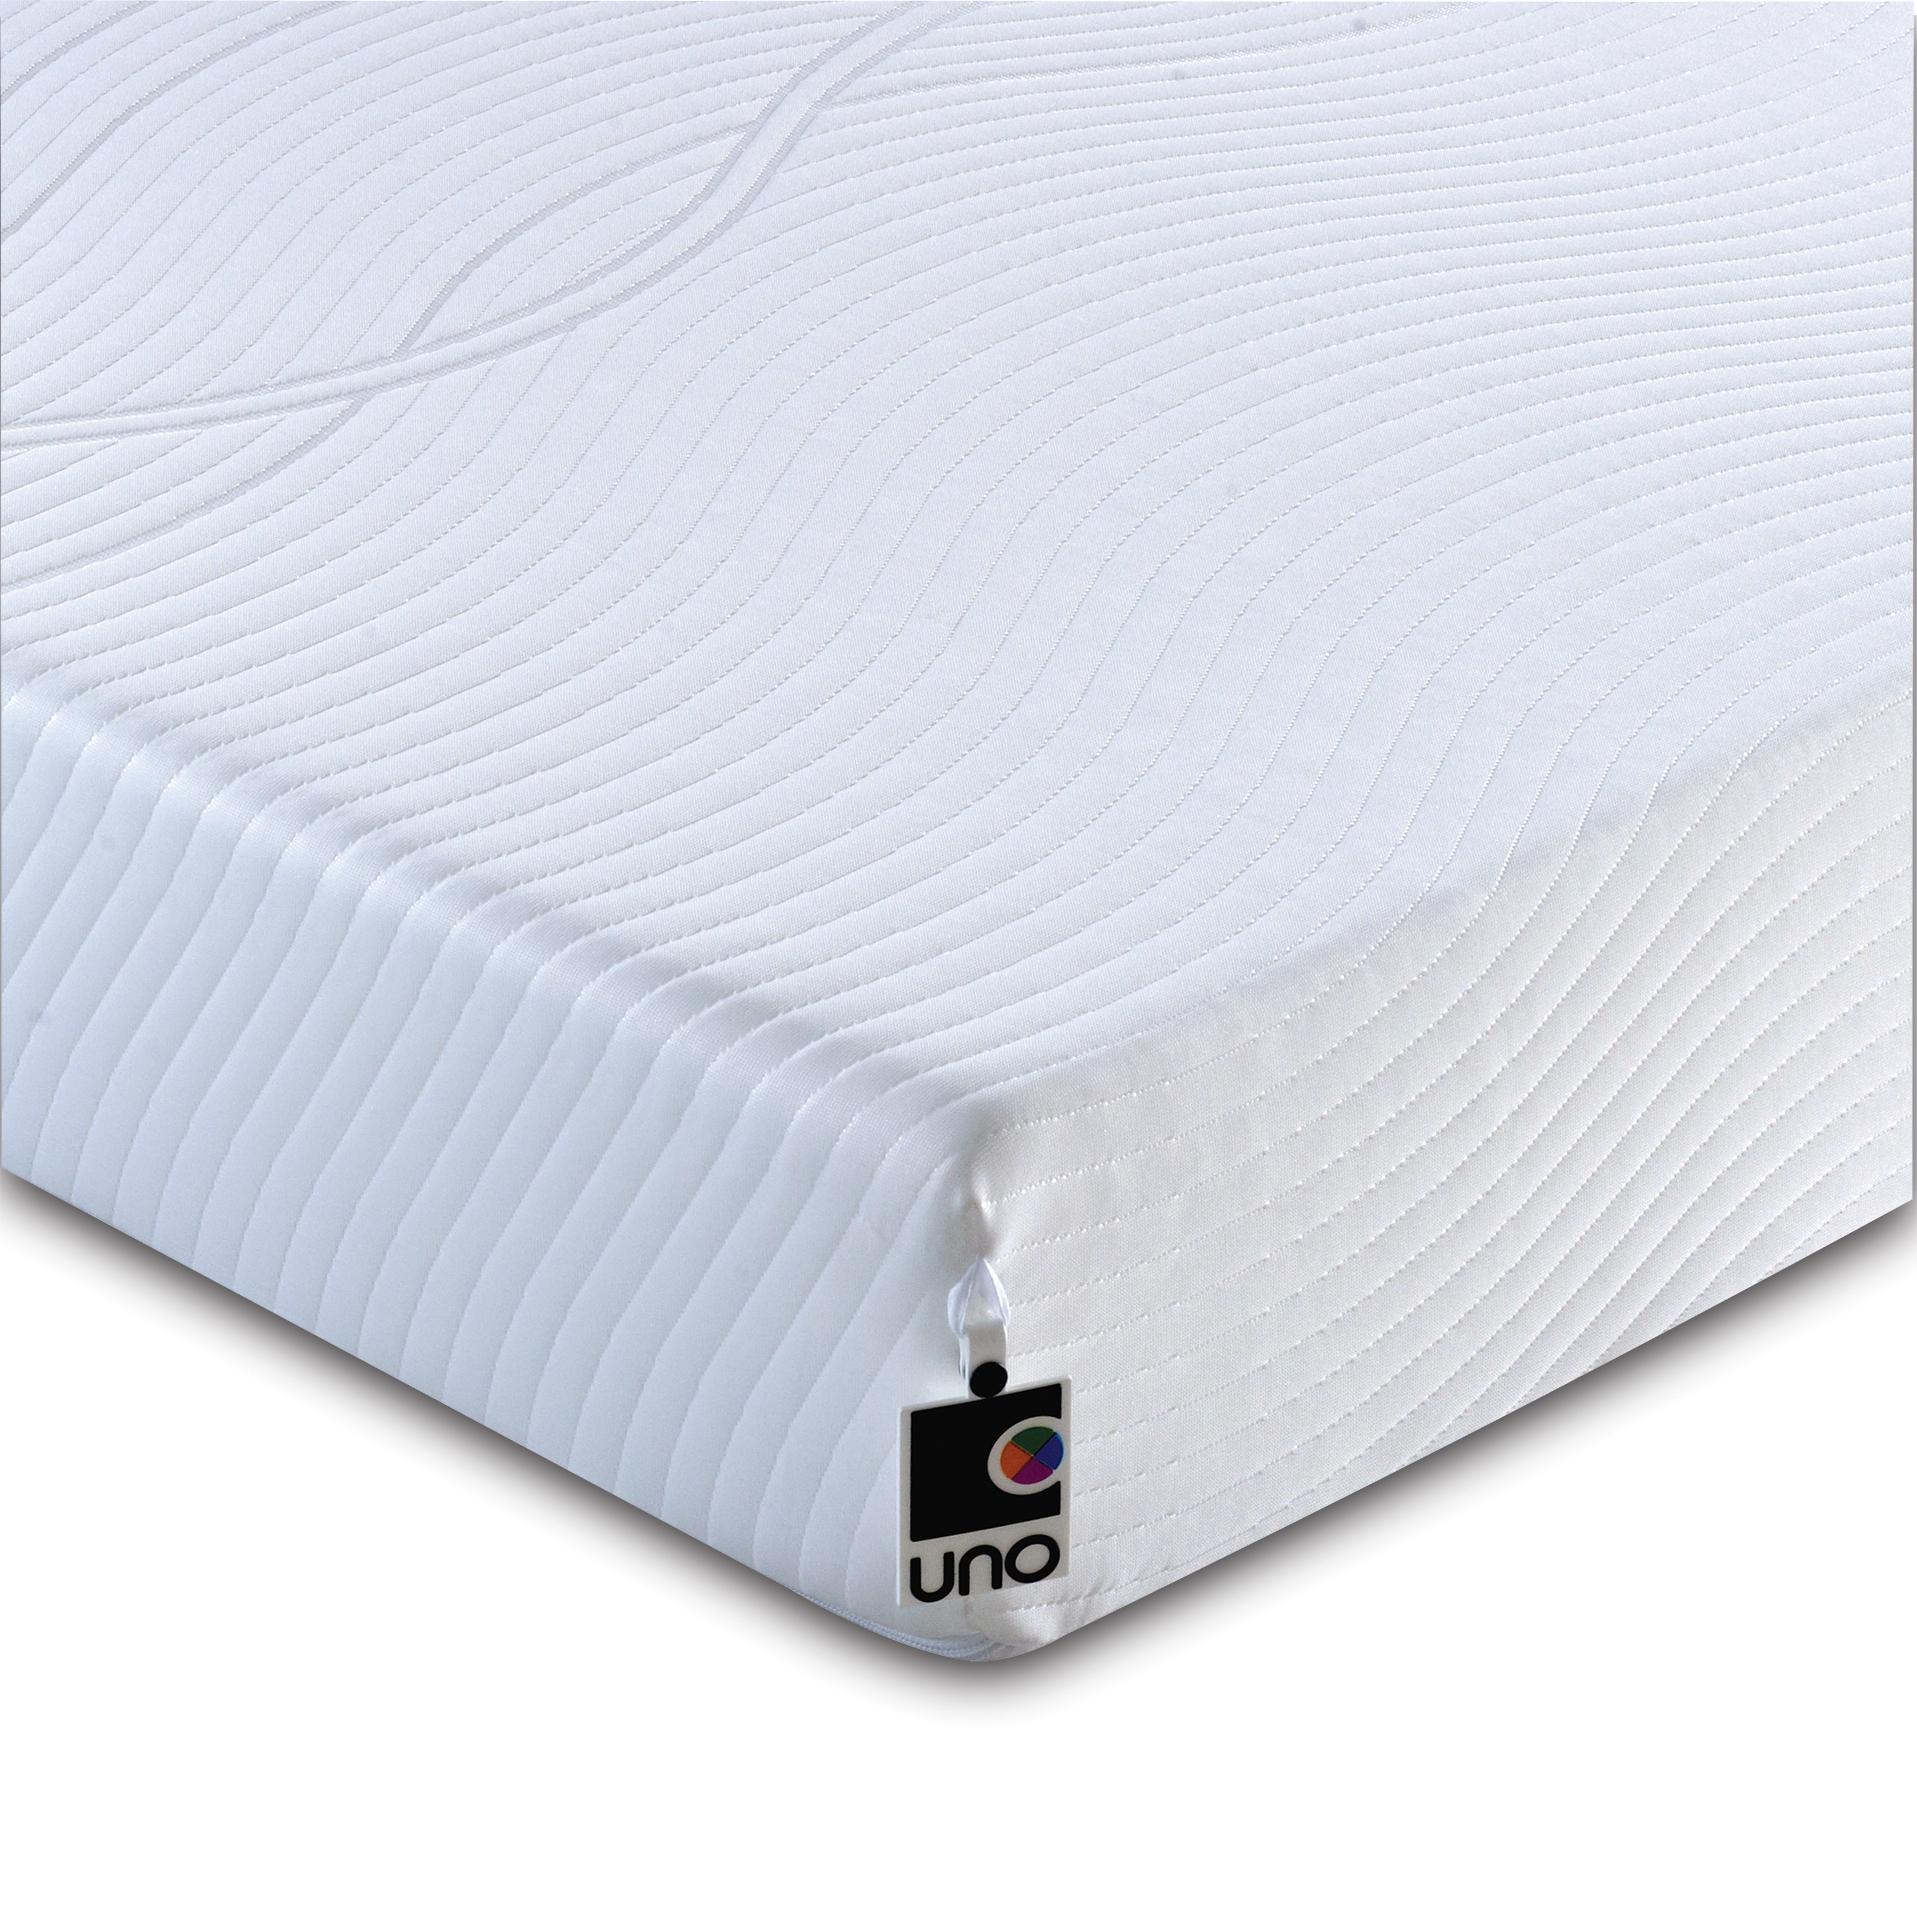 uno vitality plus memory foam mattress